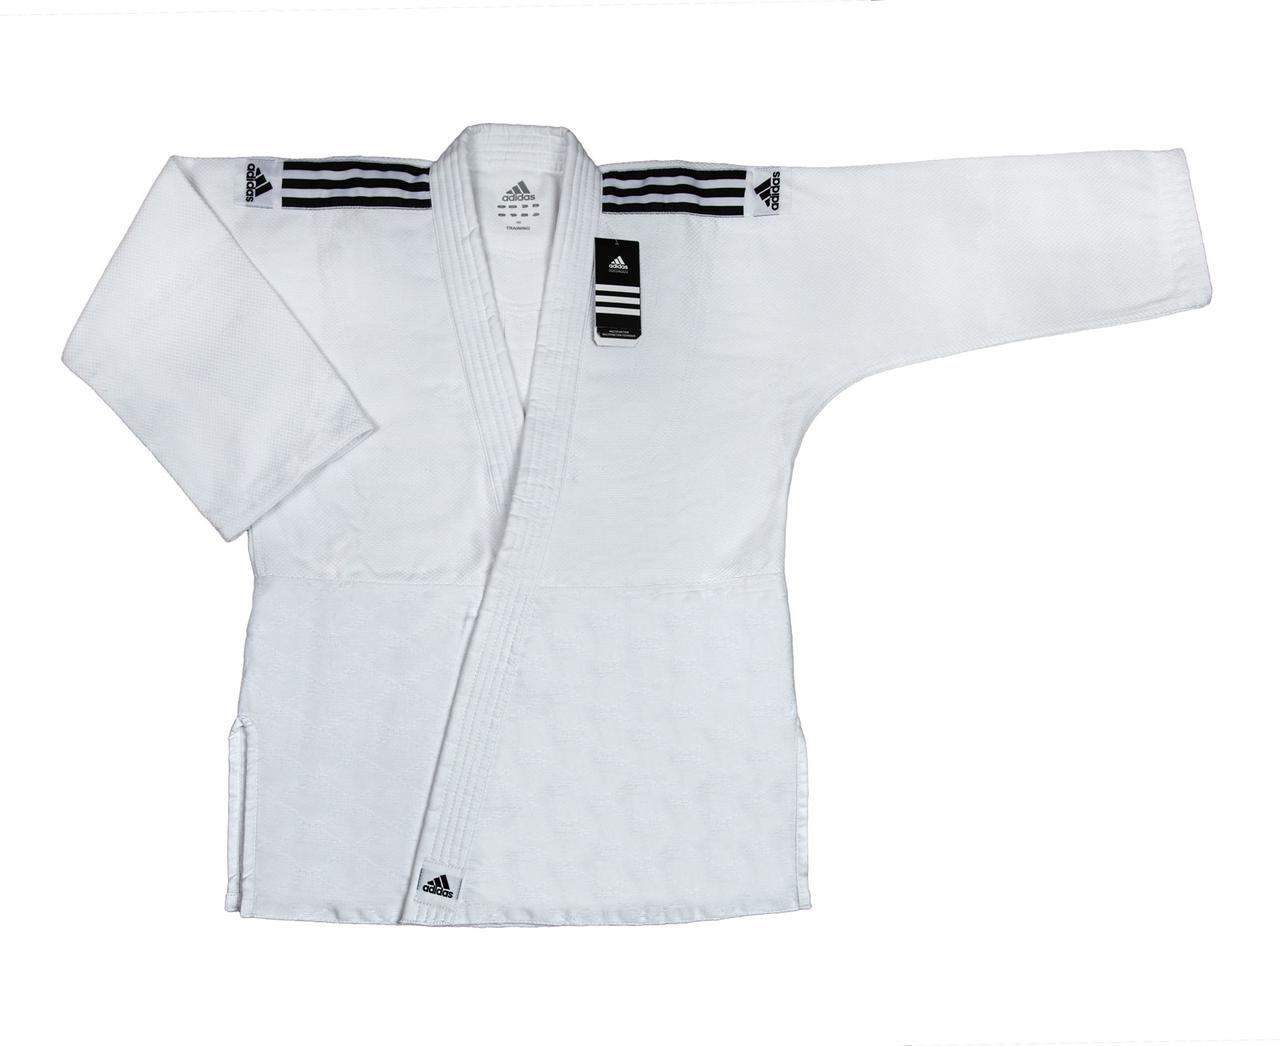 Кимоно Adidas-оригинал (Дзюдо)